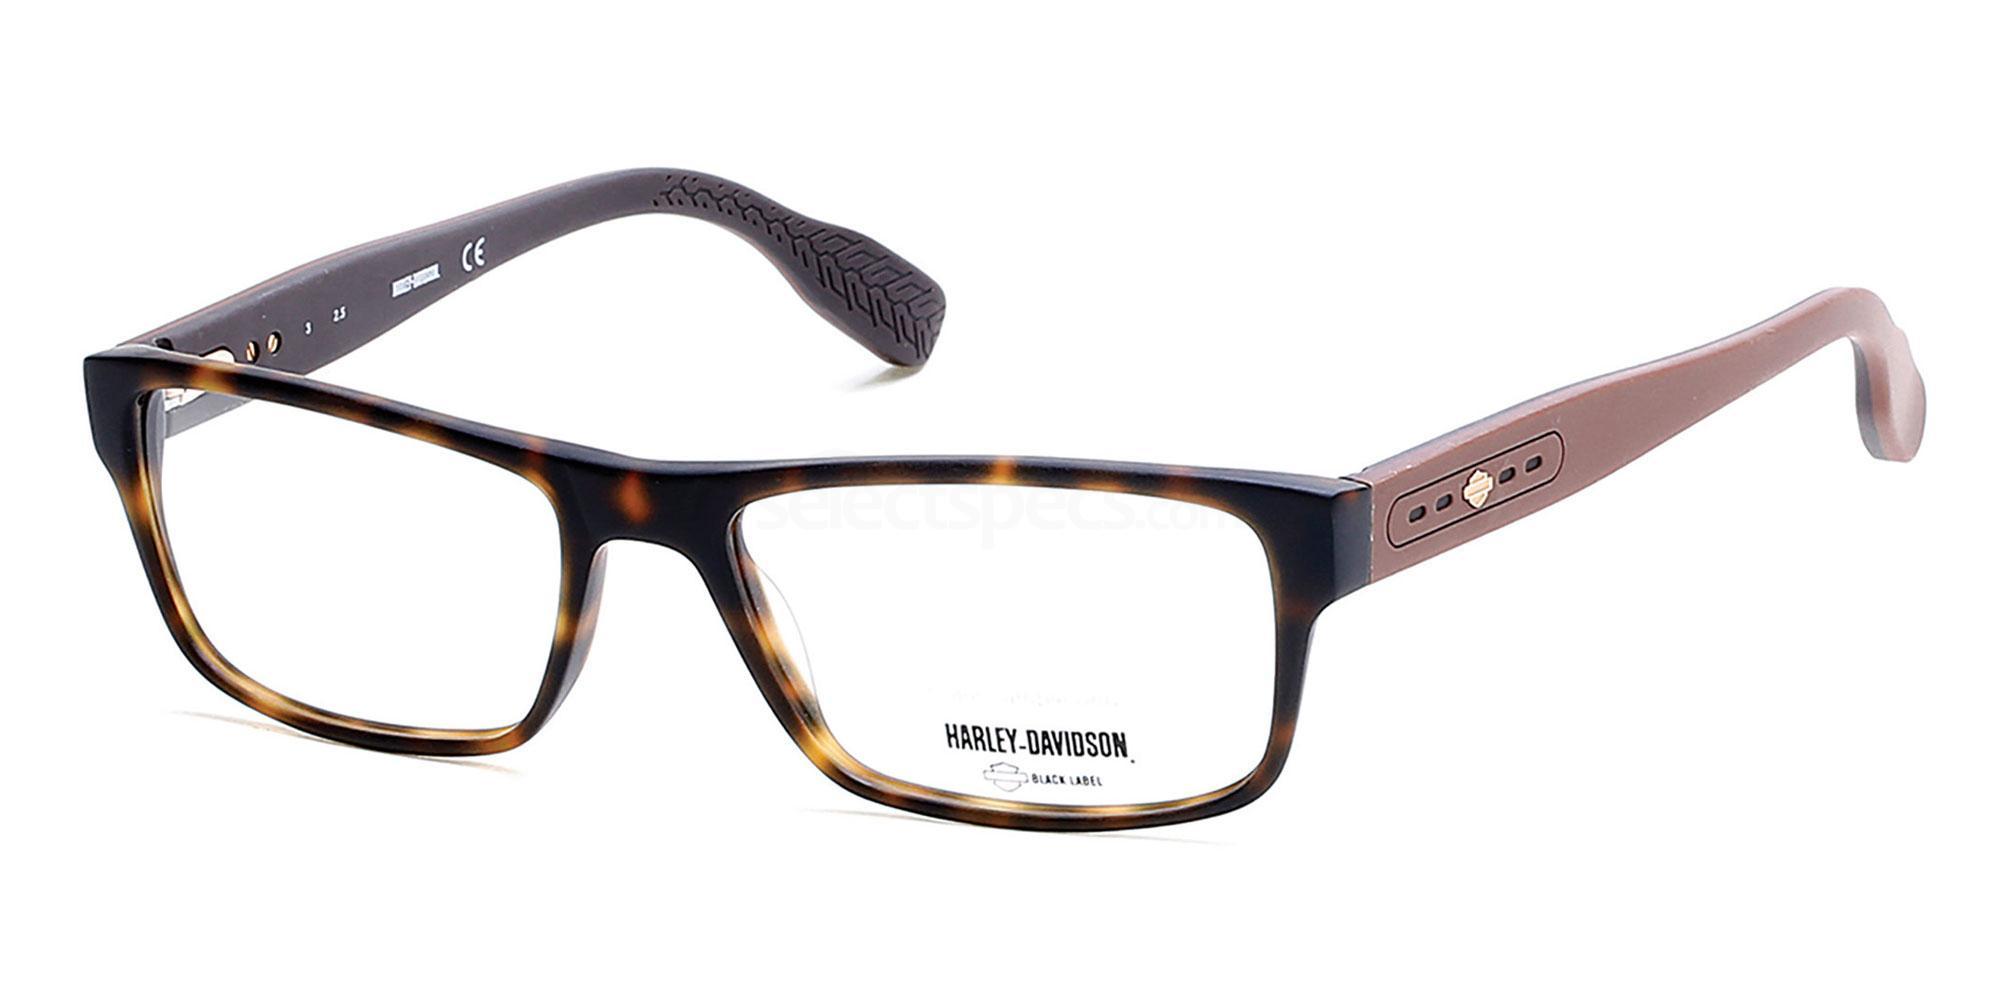 052 HD 1038 Glasses, Harley Davidson